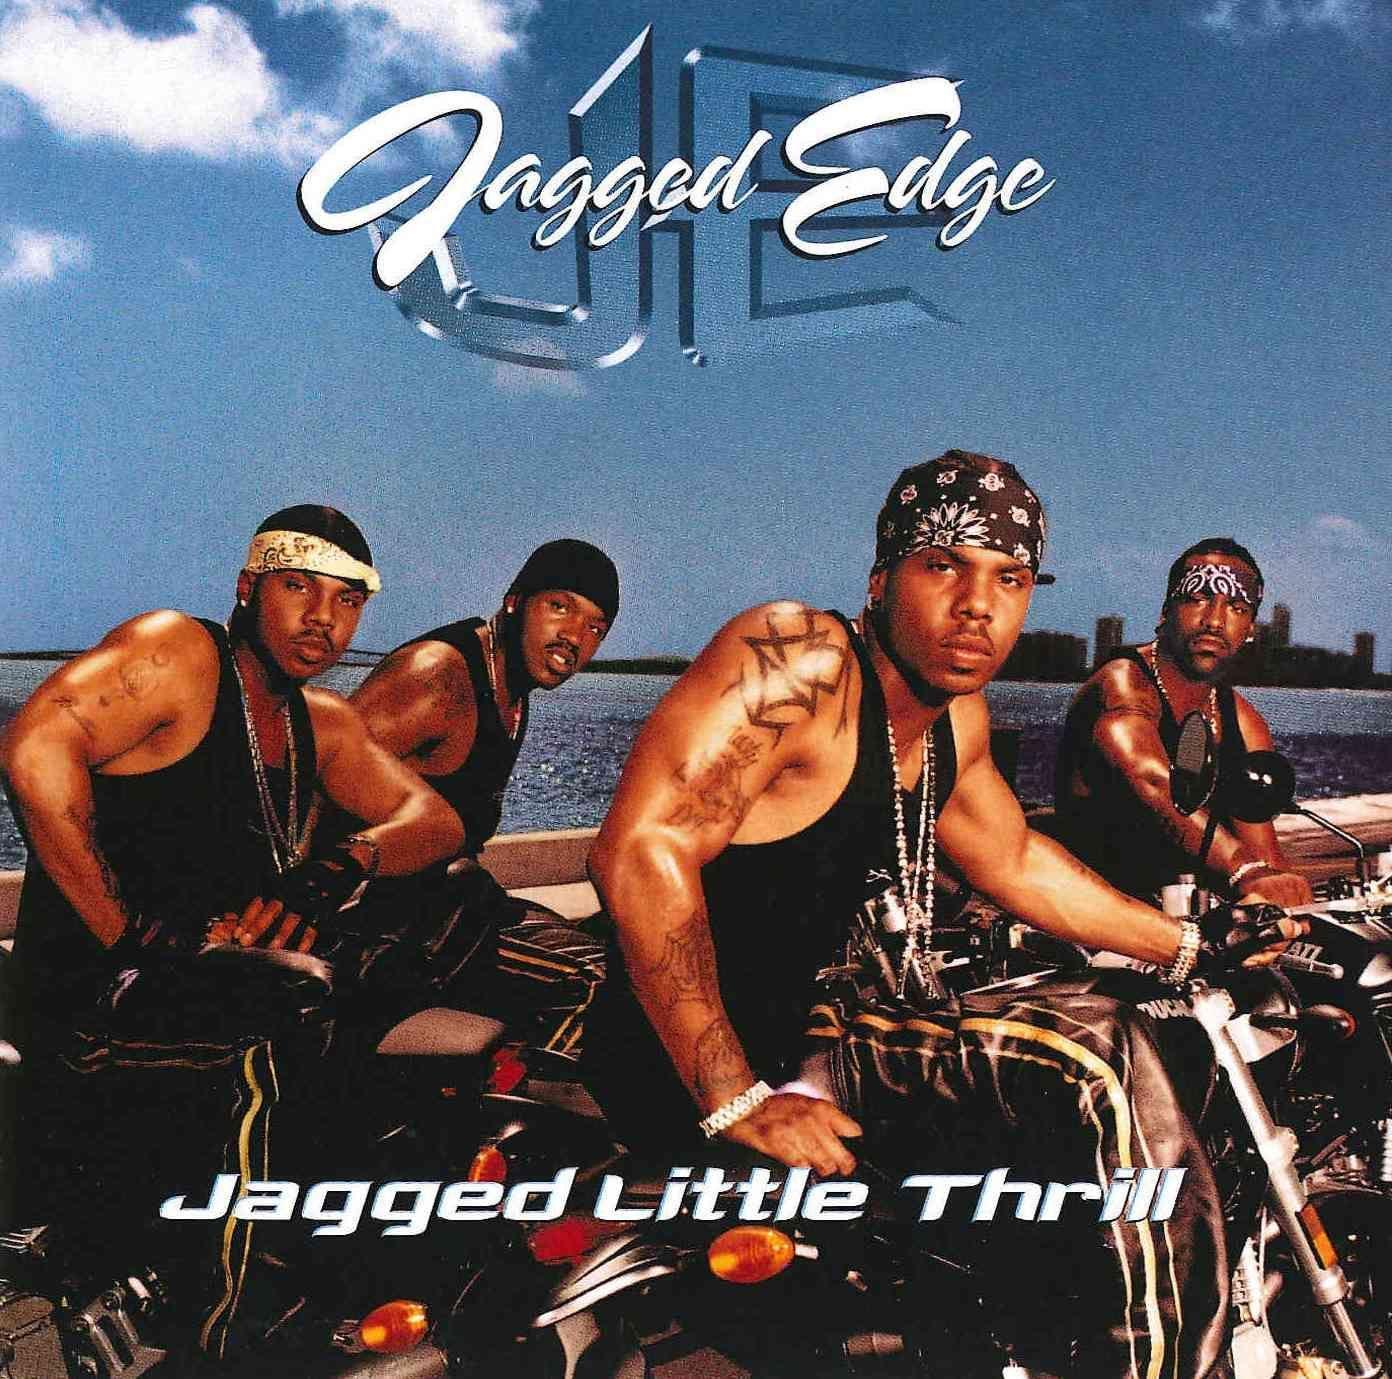 Jagged Edge Songs List Top jagged edge: brian casey, brandon casey, kyle norman, wingo